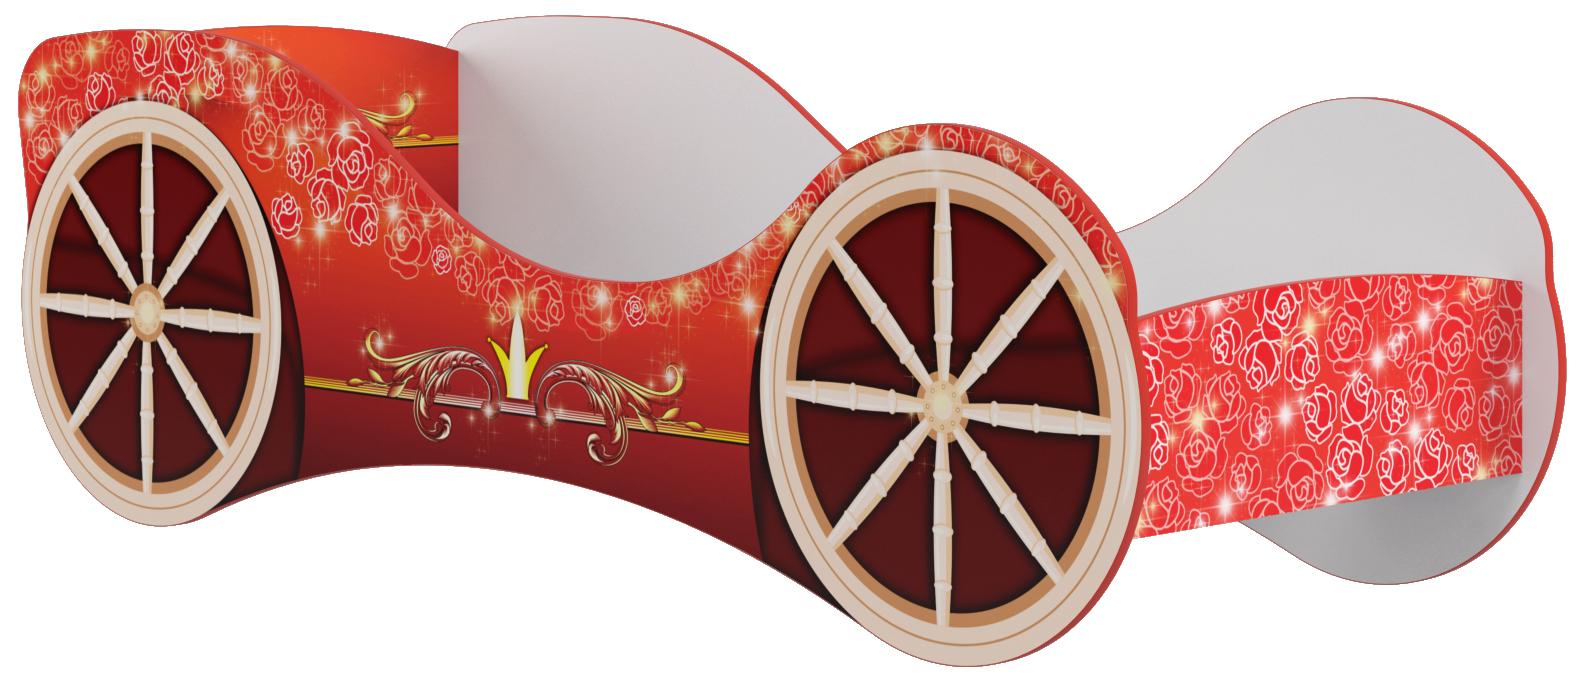 Кровать КР-8 Принцессы 700х2130х830